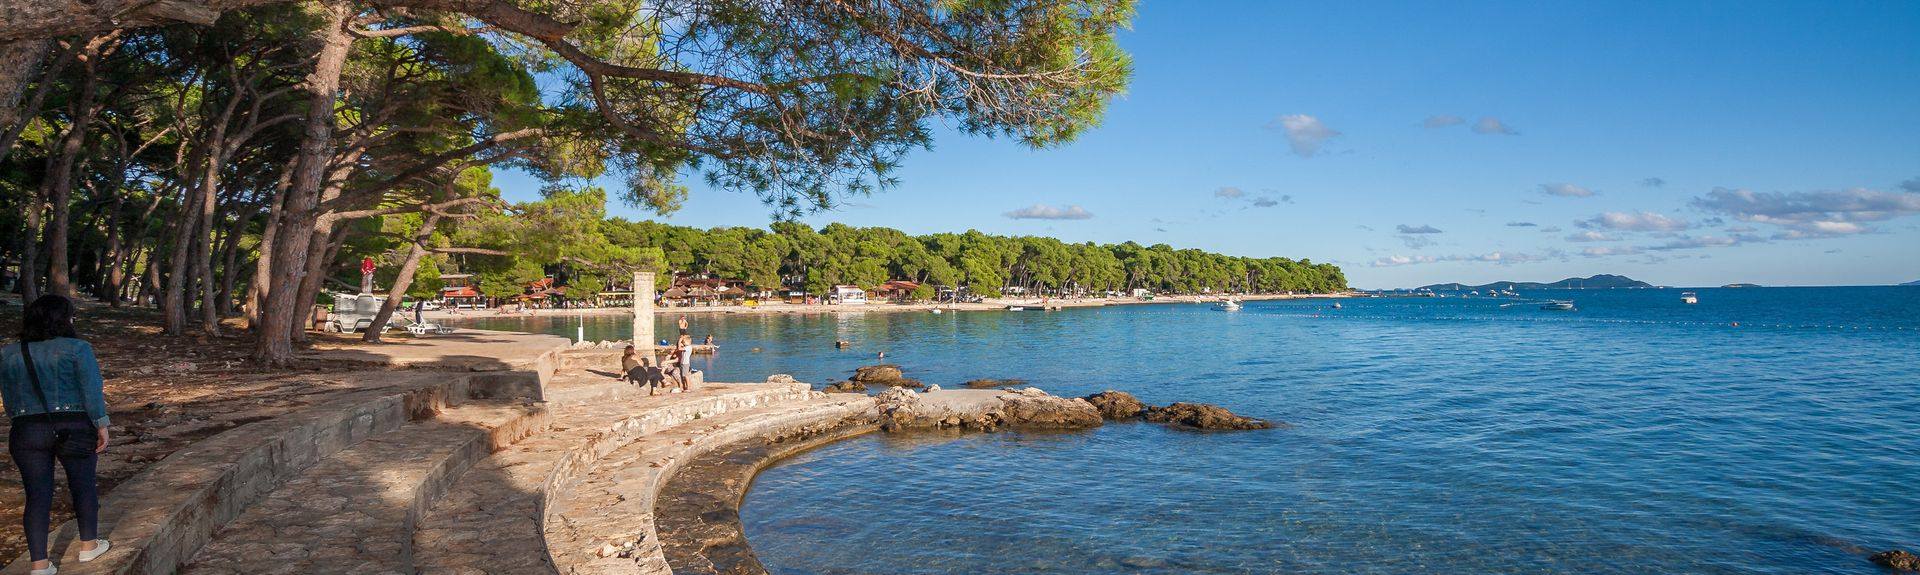 Galovac, Zadar, Croacia